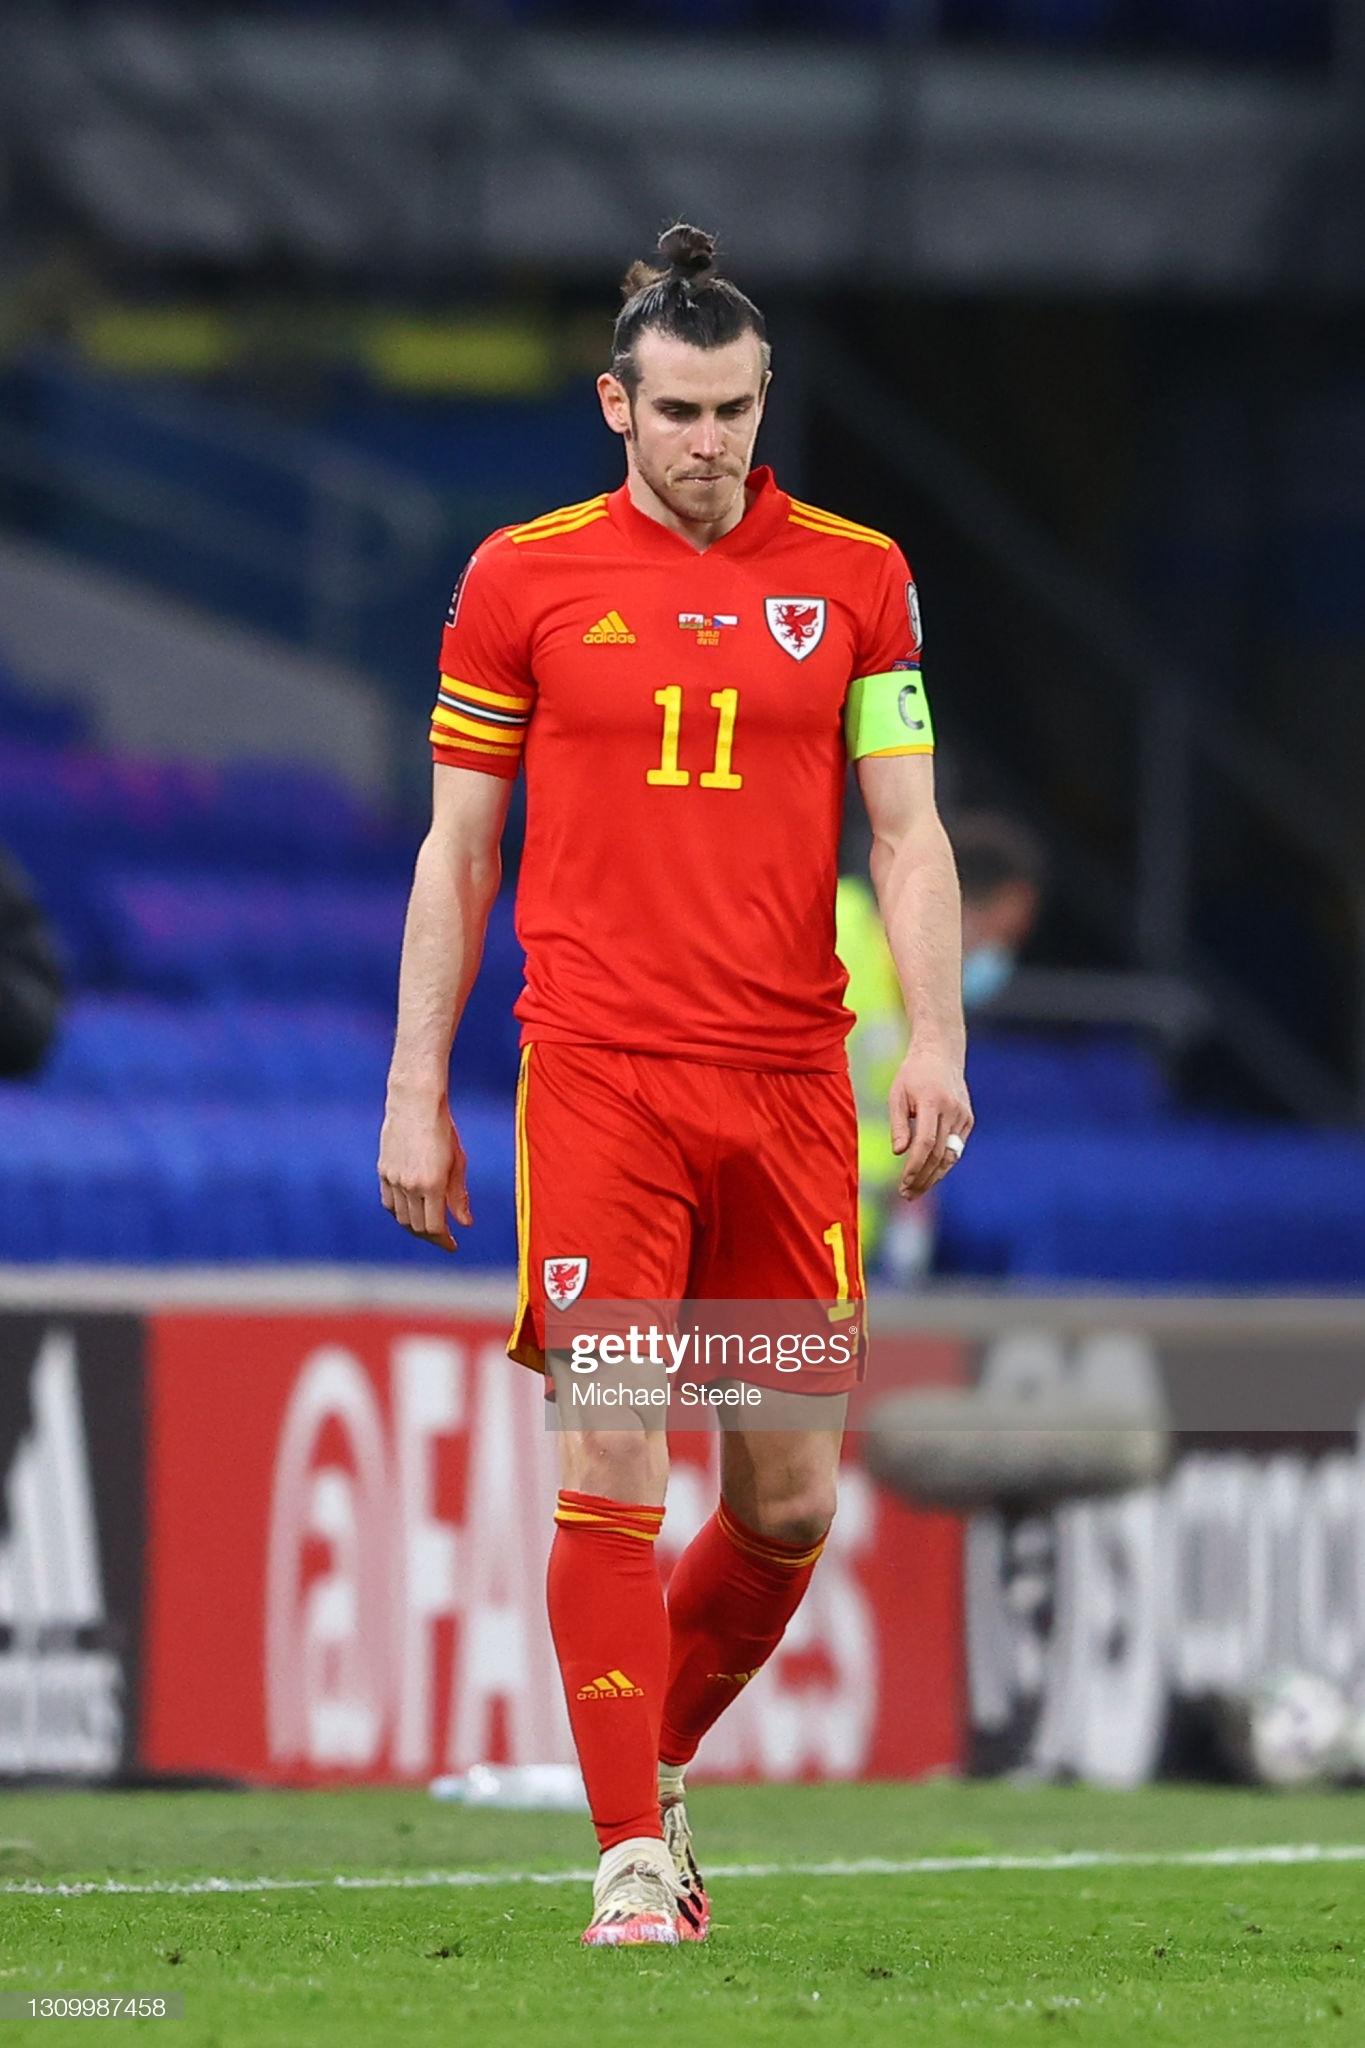 [Image: CARDIFF-WALES-MARCH-30-Gareth-Bale-of-Wa...ifying.jpg]